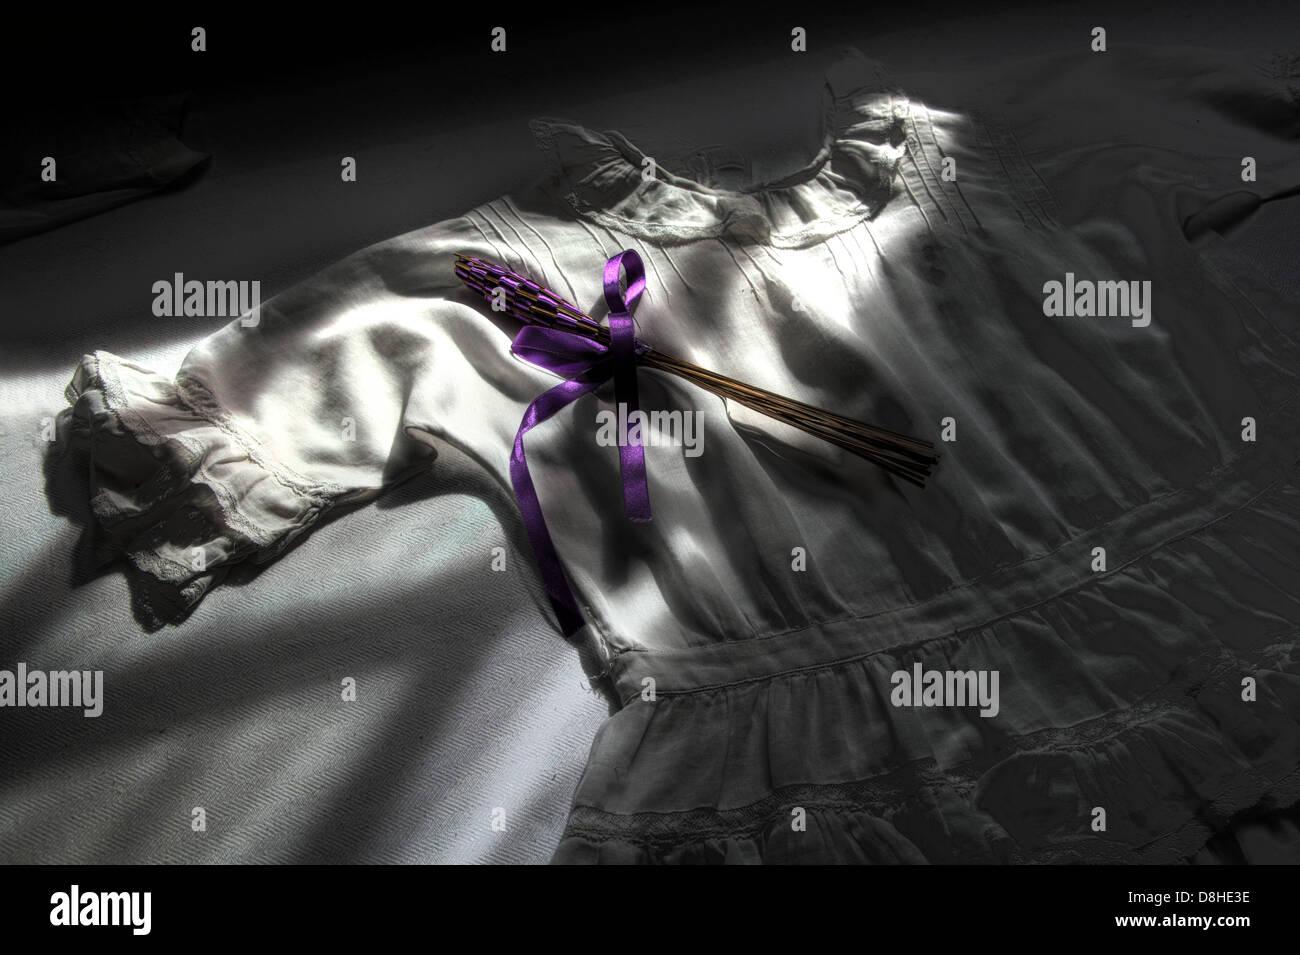 Dieses Stockfoto: Weiße Kittel, Lila Schärpe - D8HE3E